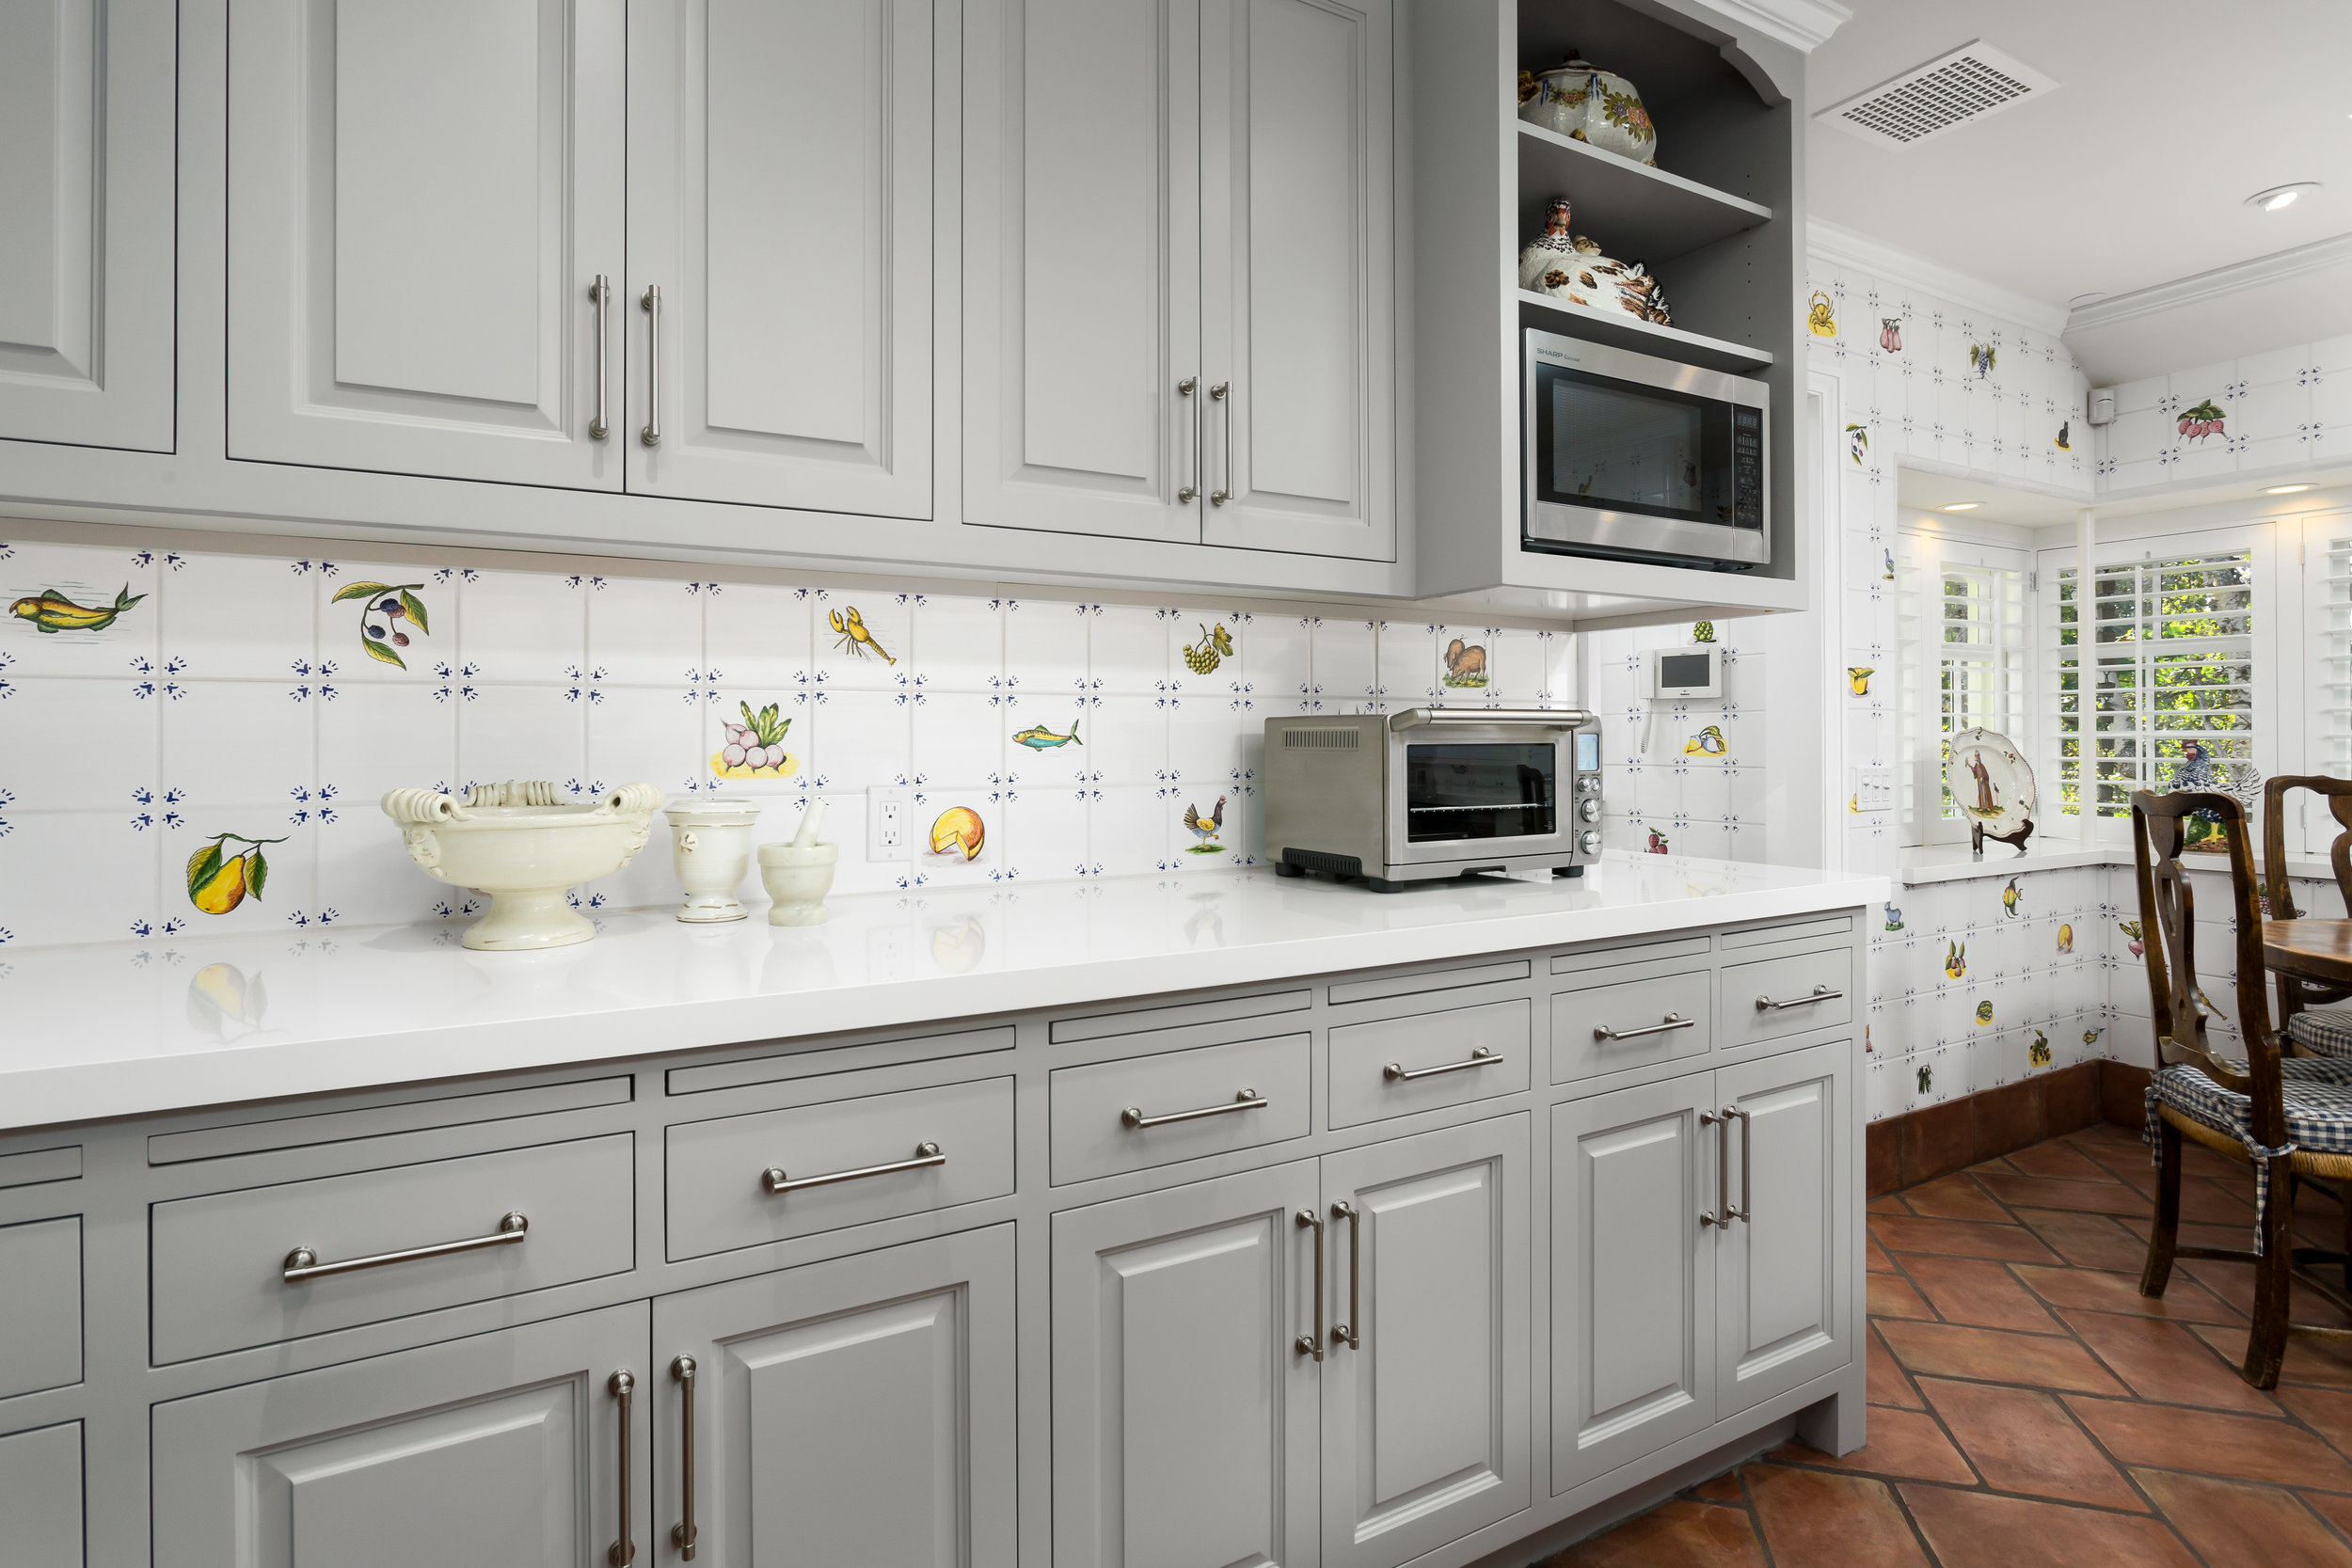 gray-kitchen-cabinets-backsplash-Chelsea.jpg